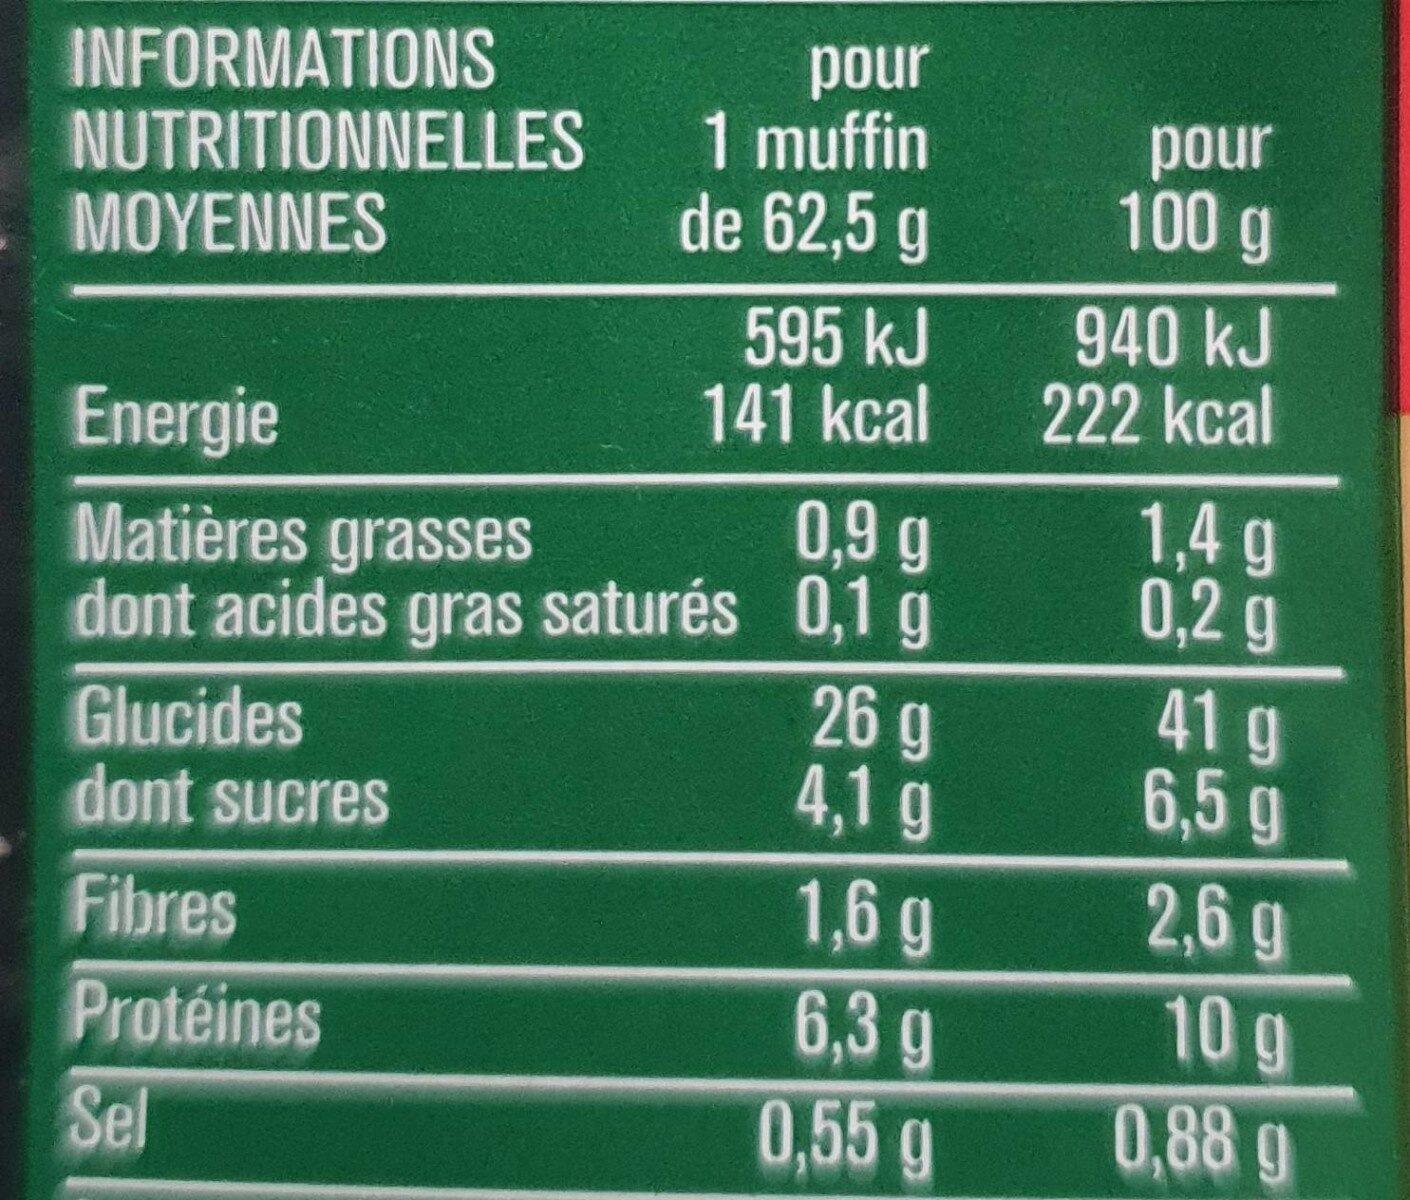 Muffins blancs - Informations nutritionnelles - fr